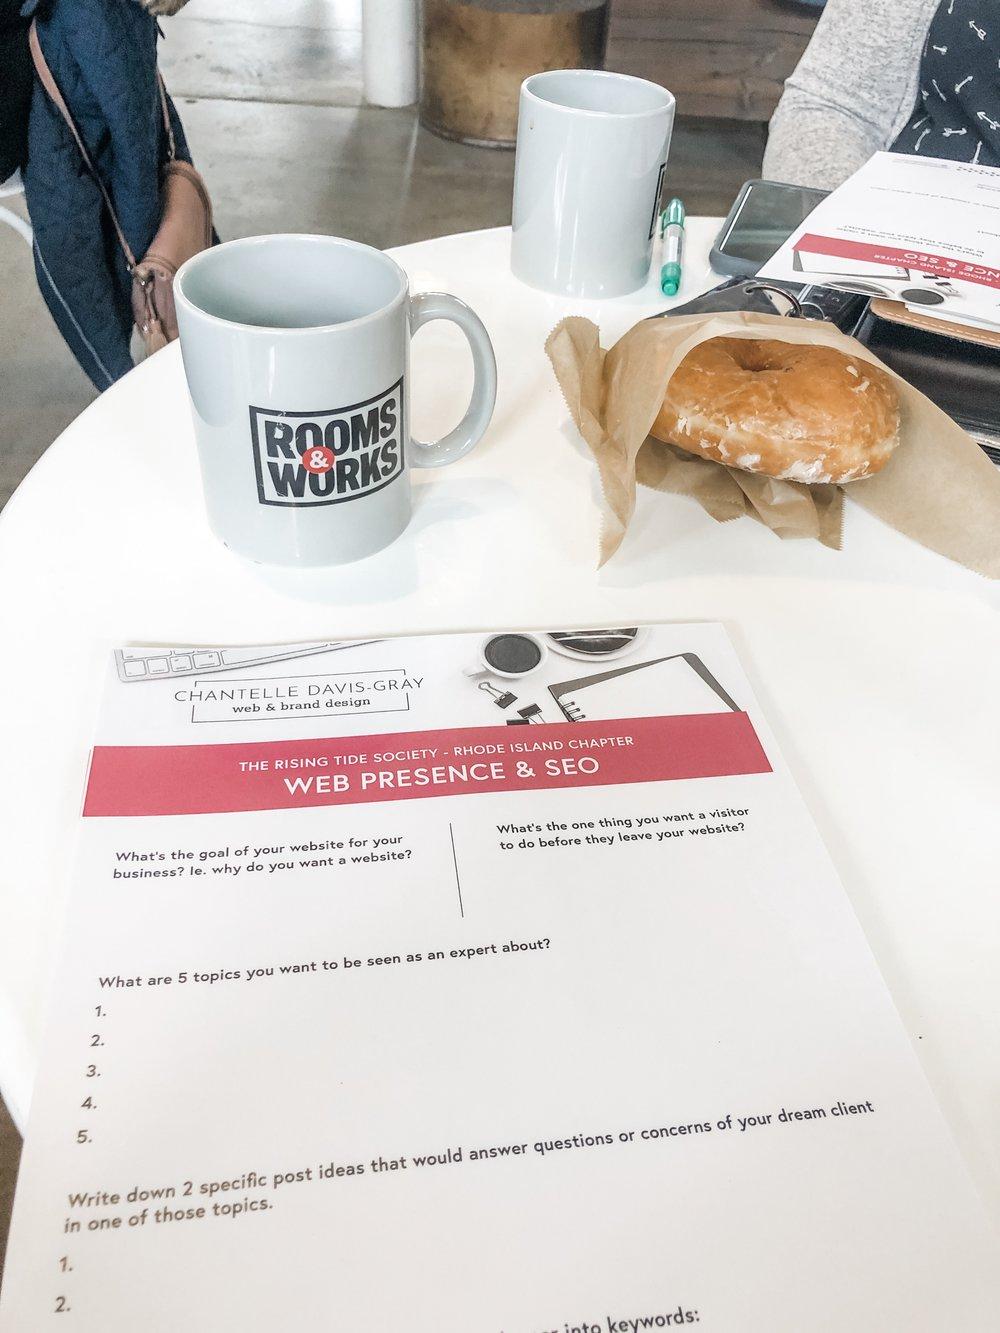 Chantelle's worksheet + coffee + a vegan Knead Doughnut made for a great meet-up!